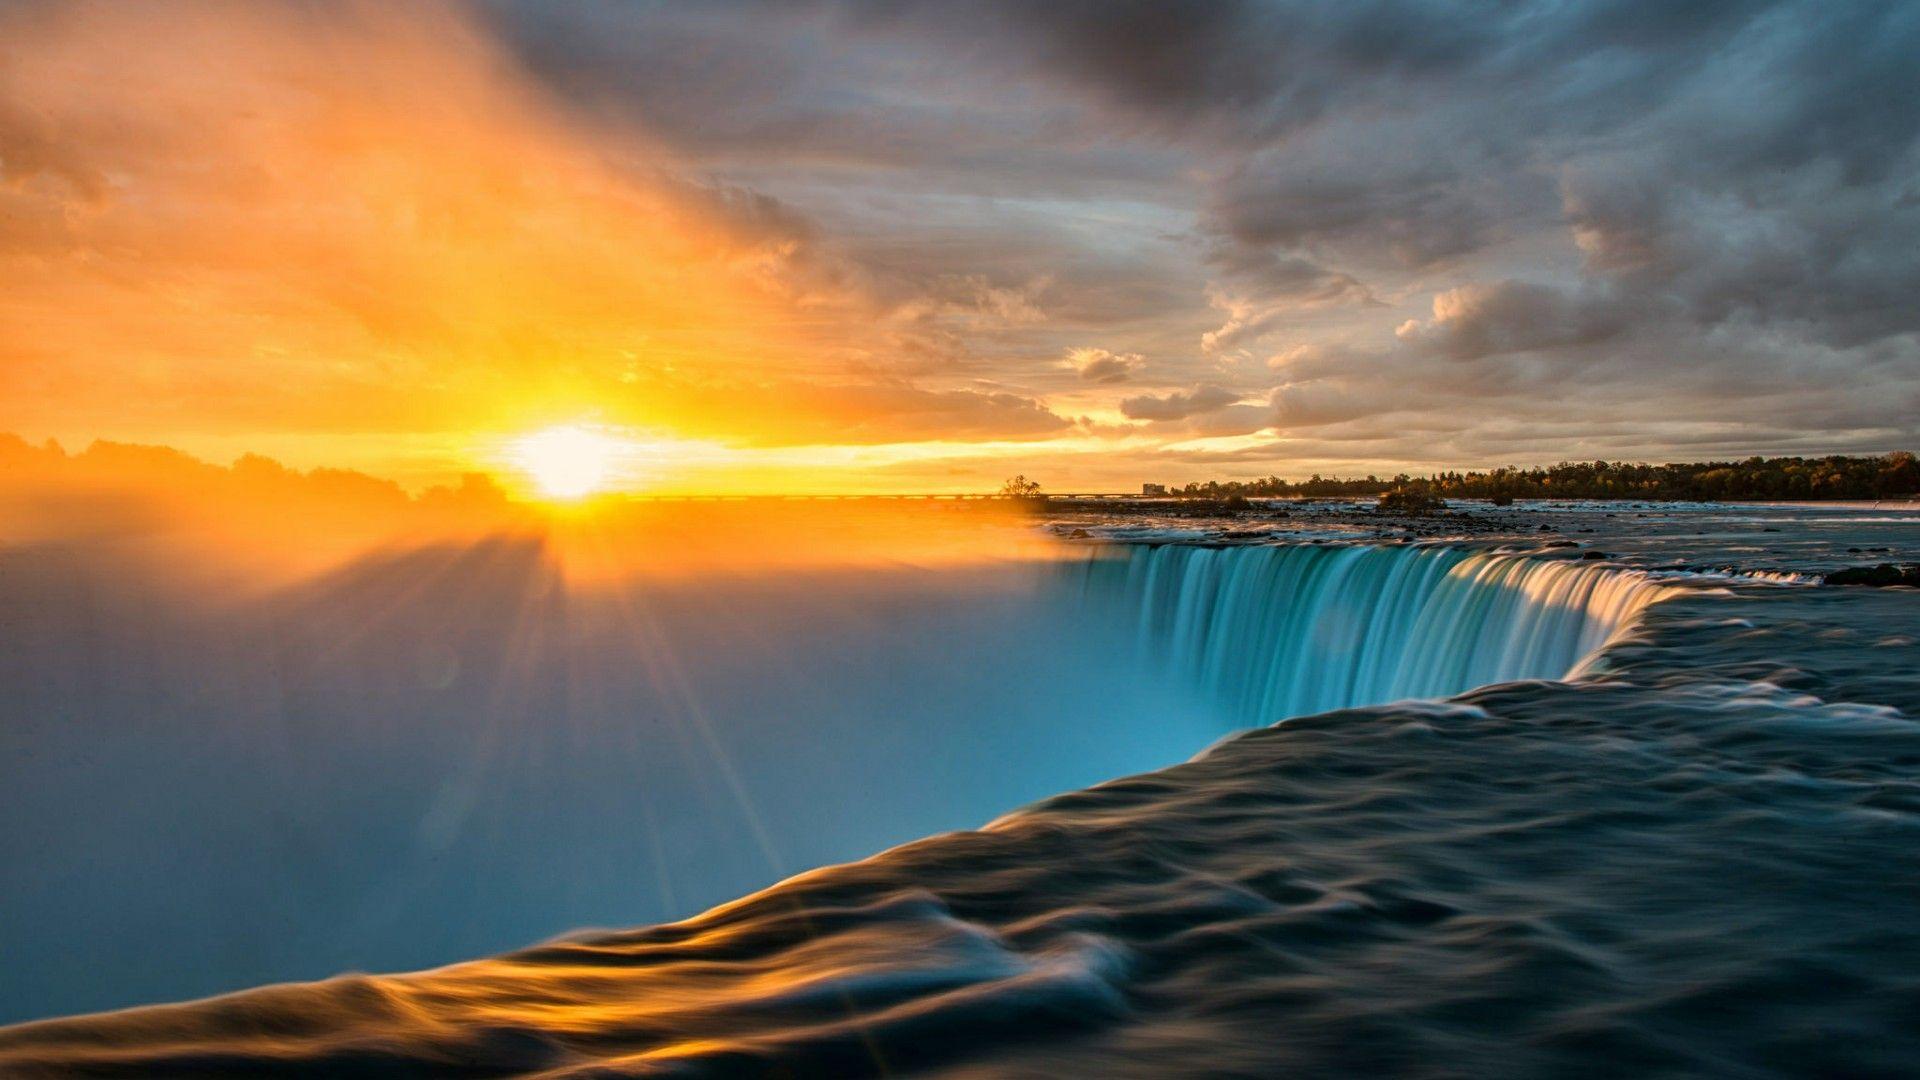 Beautiful Sunrise Over Niagara Falls Ontario Canada. #sunrise #vacation #travel #cooldown #